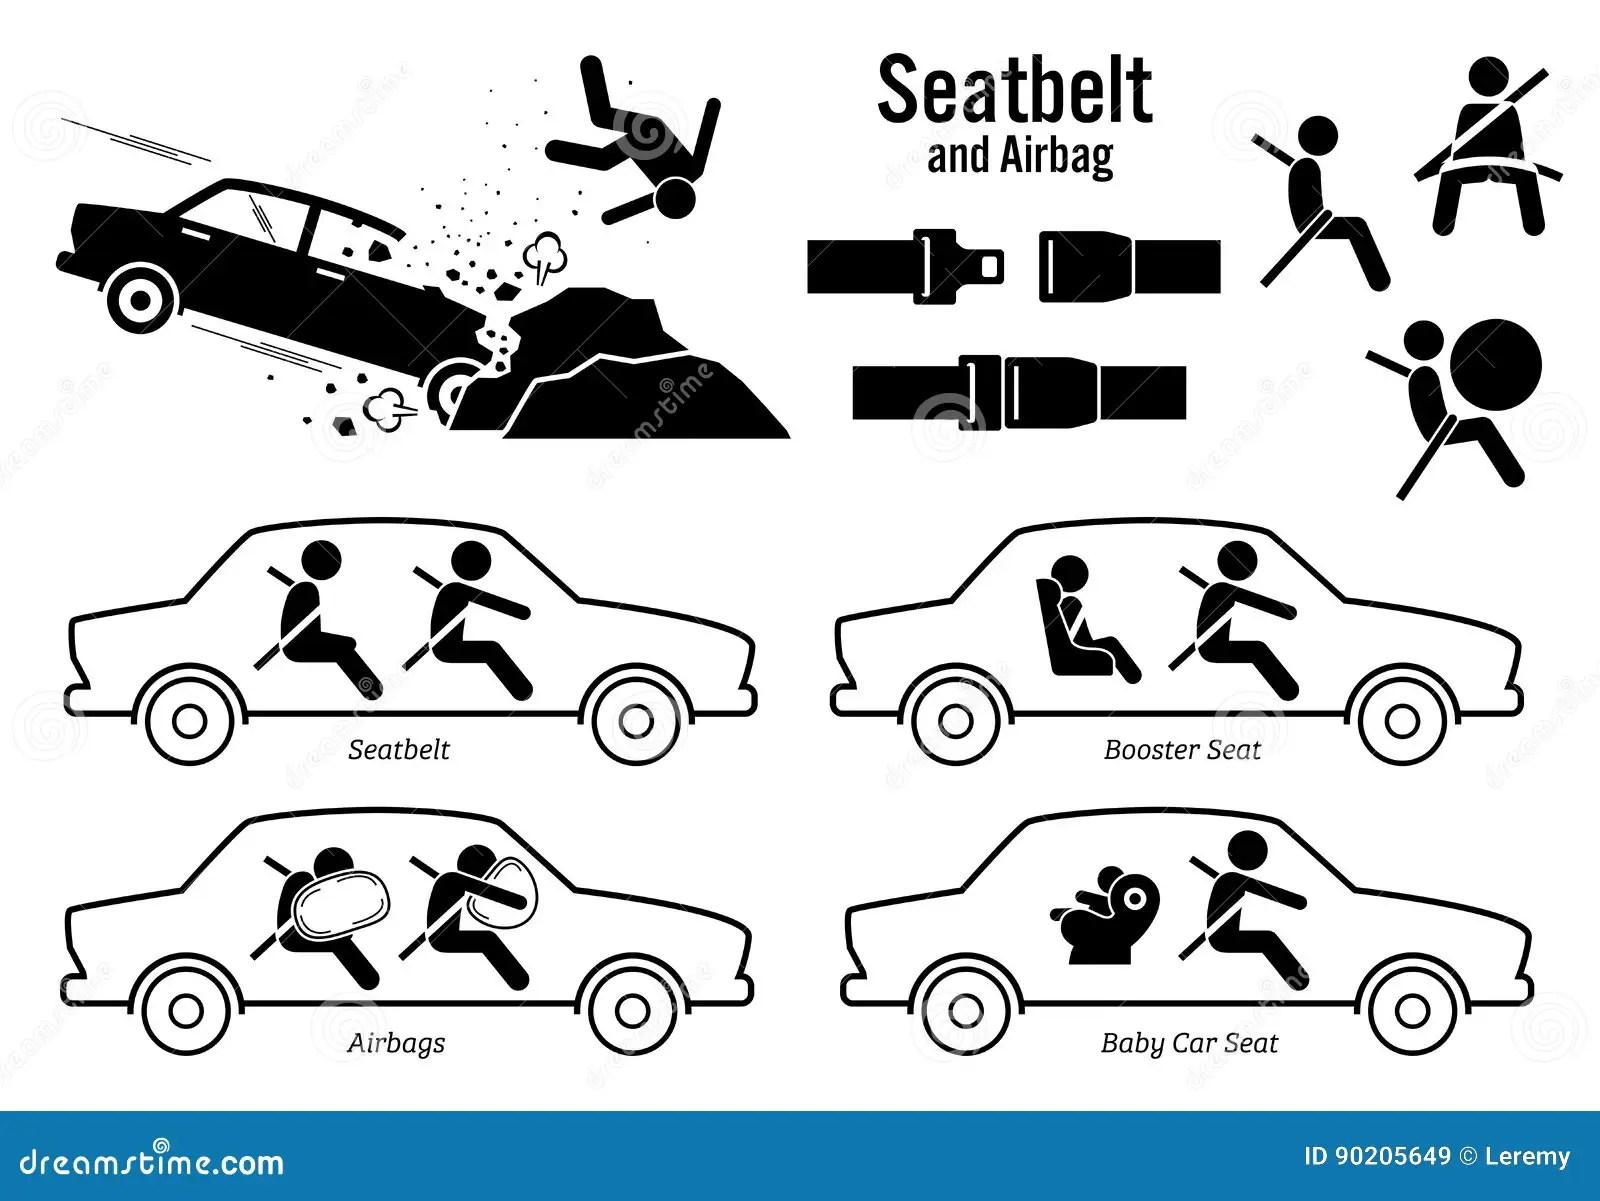 car seat hcpc